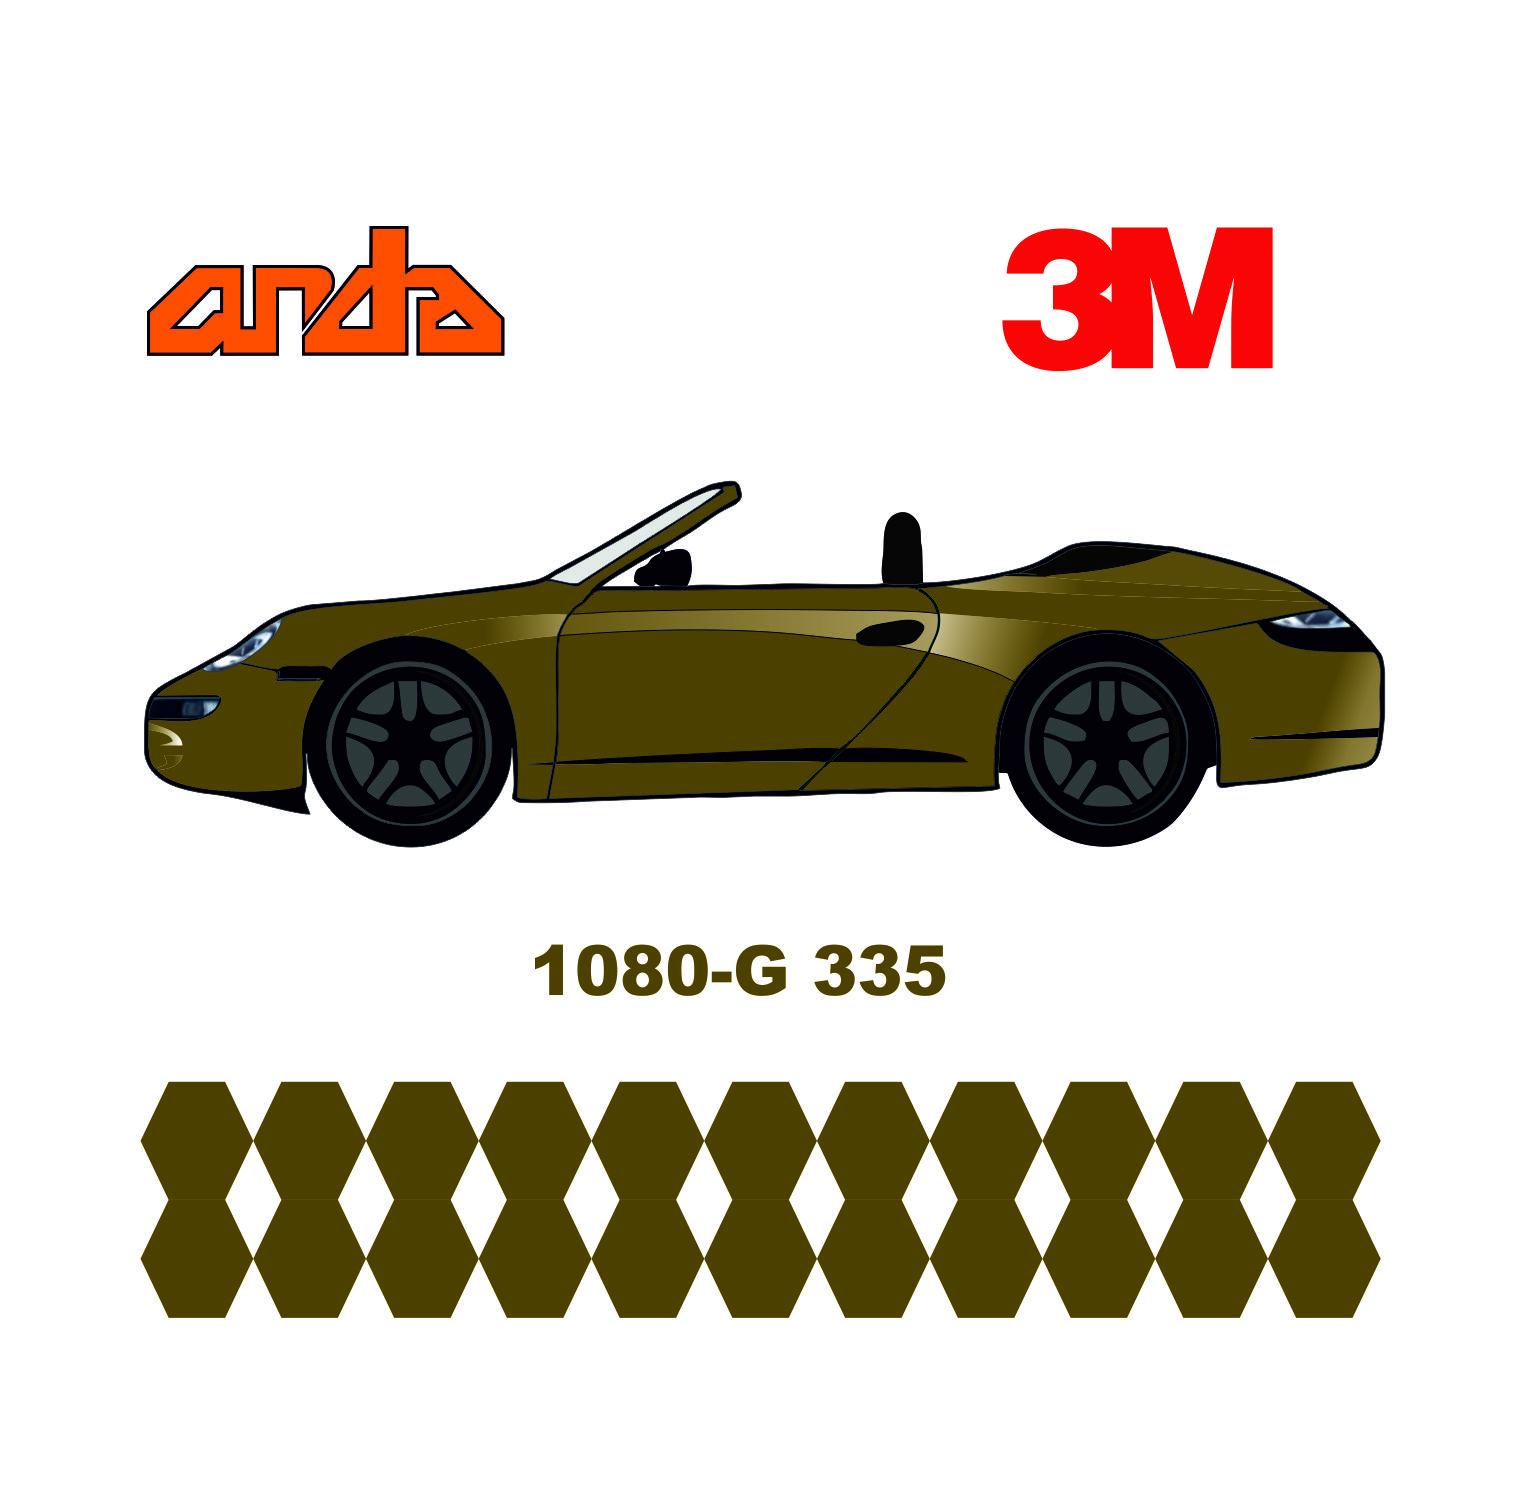 3M 1080-G335 Parlak Metalik Sarı 1